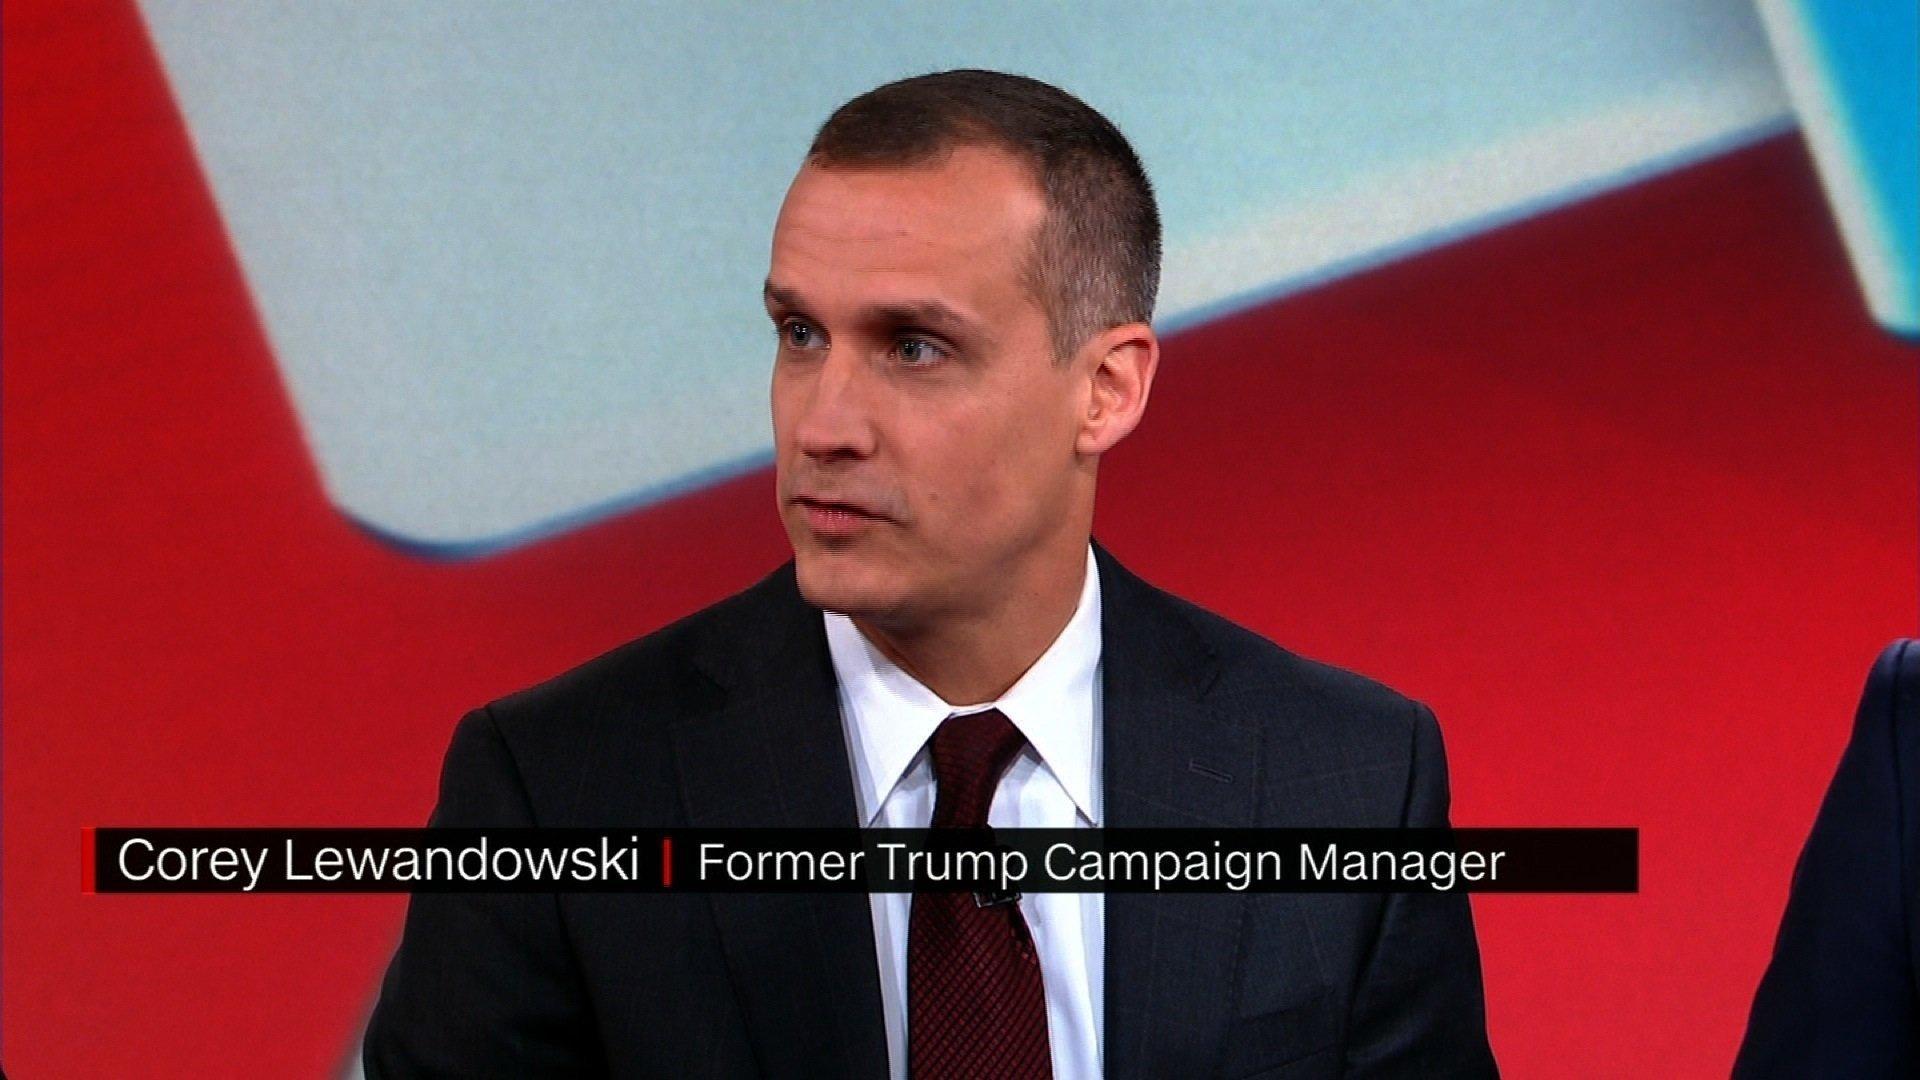 Corey Lewandowski, former Trump campaign manager, leaves CNN